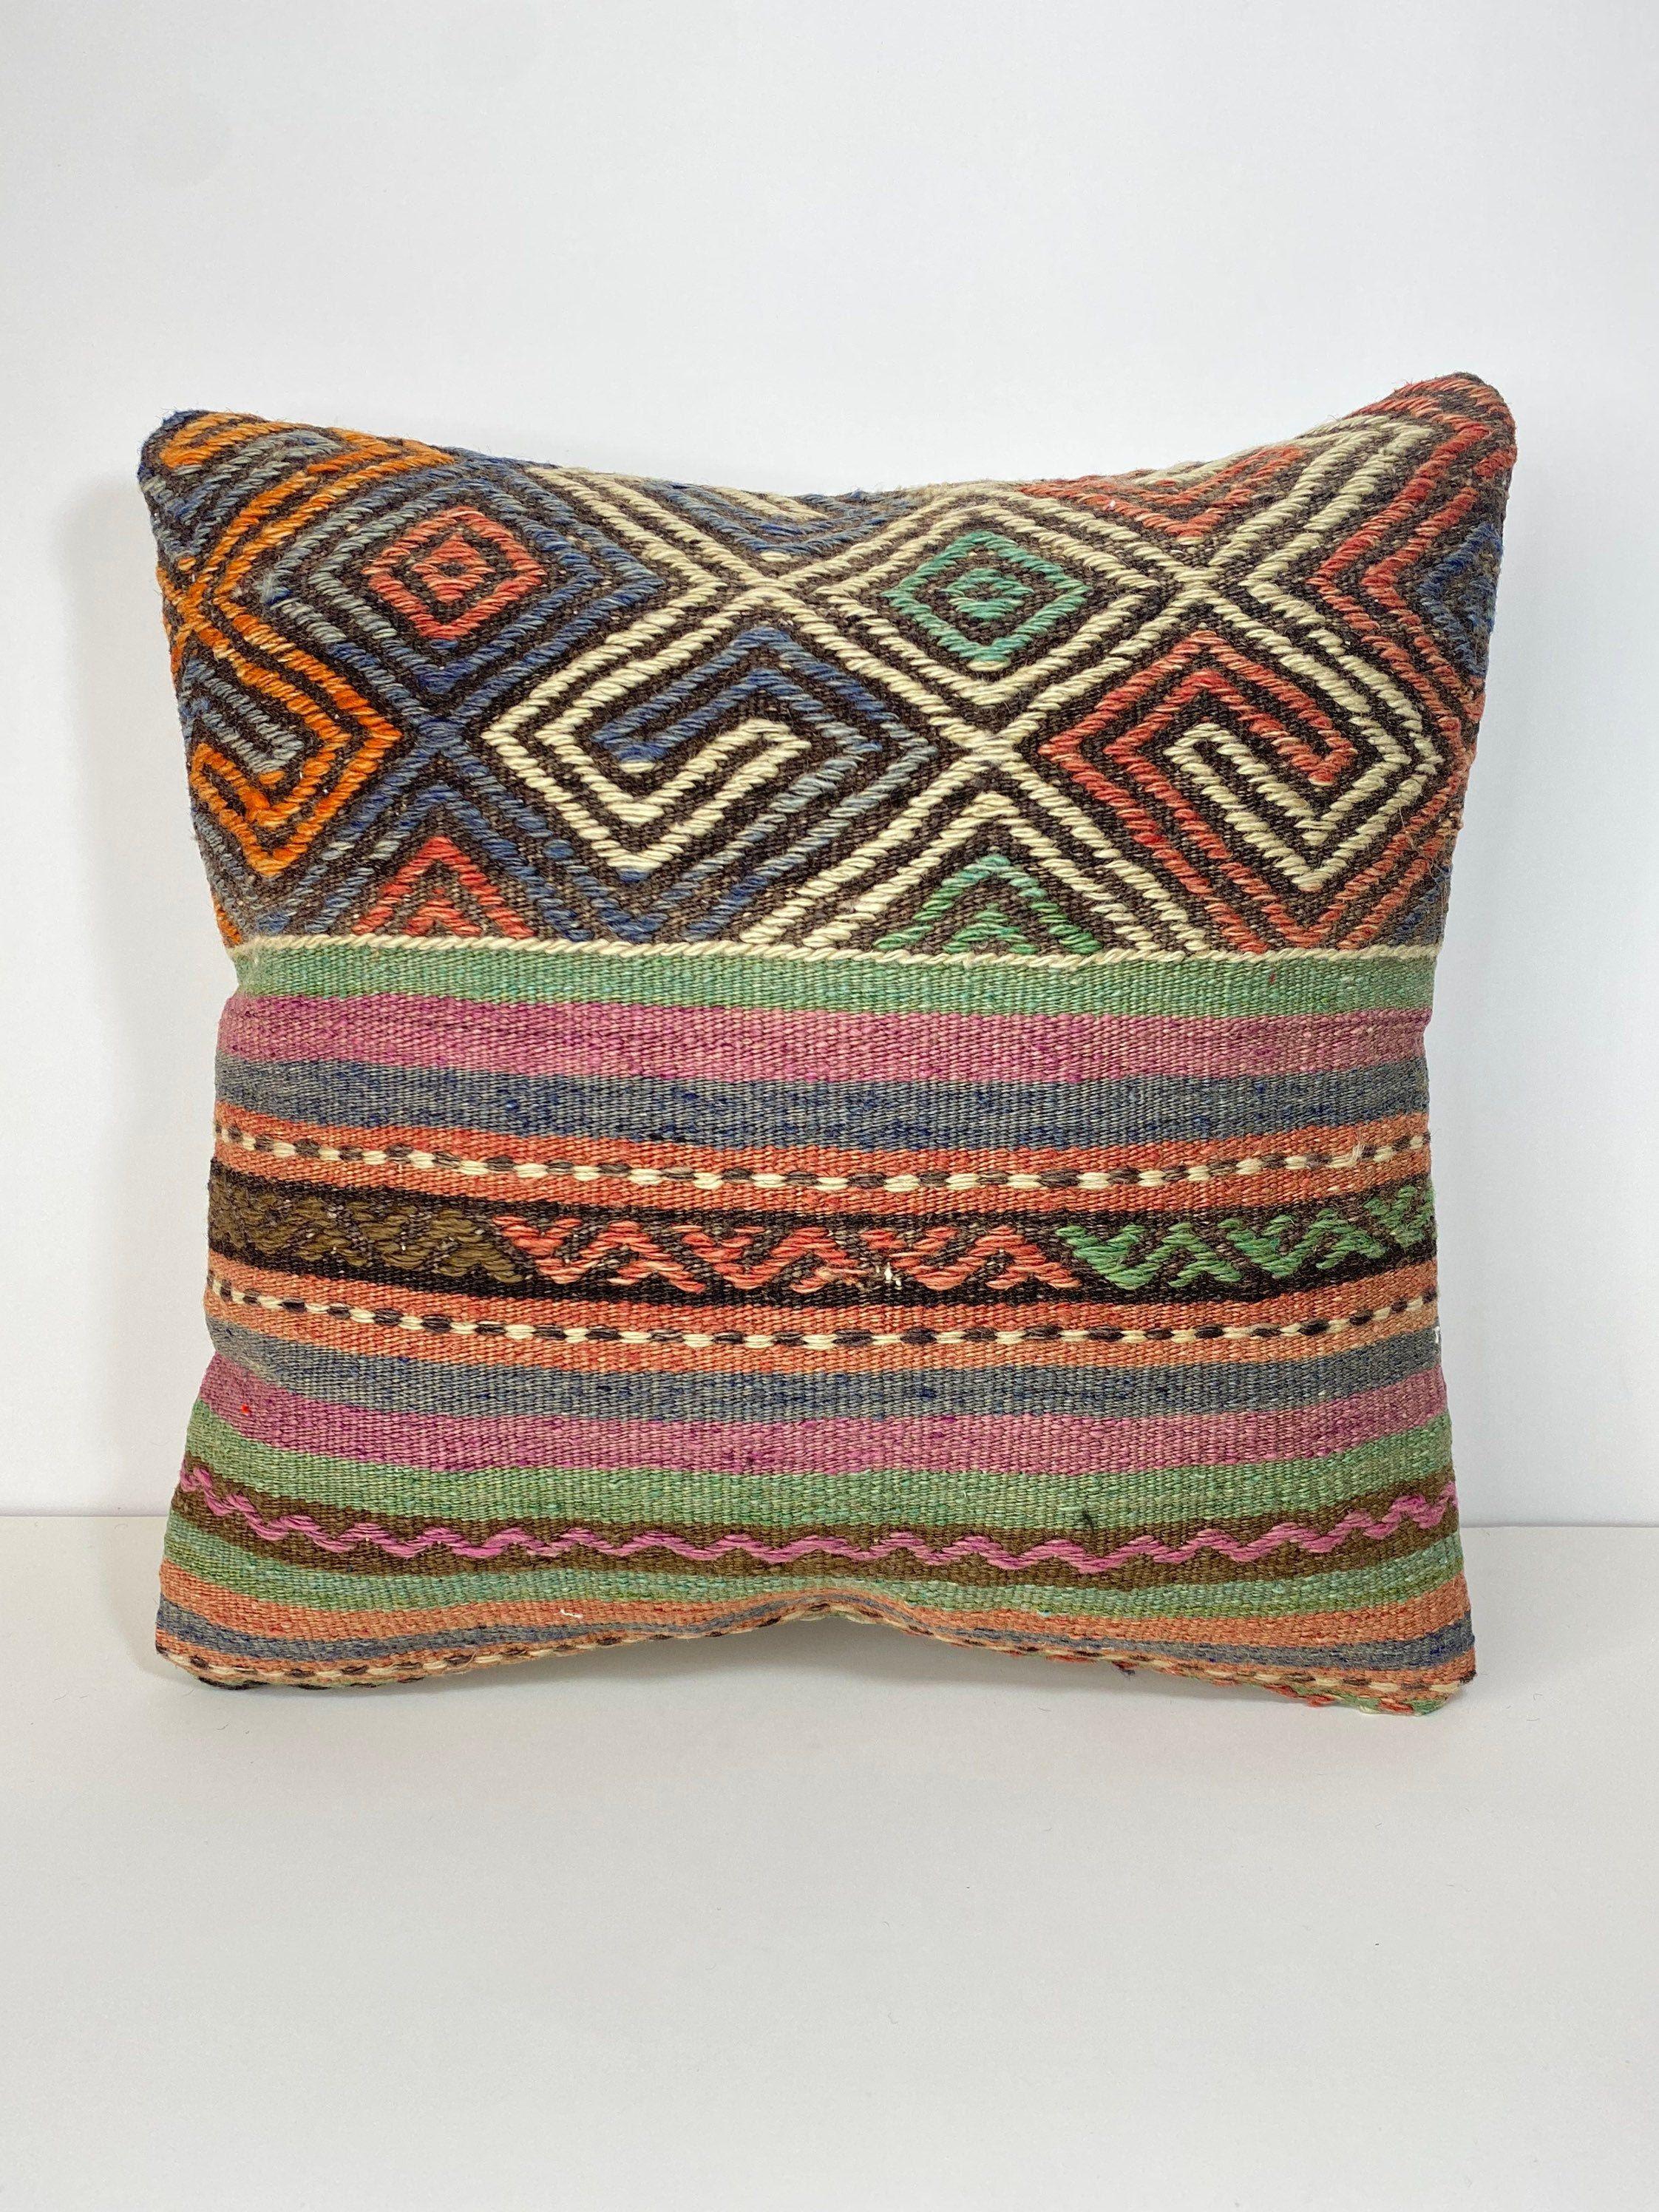 kilim pillow,bohemian pillow,turkish,vintage,handwoven pillow,home living,home decor,throw pillow,accent pillow,16x16,decorative pillow